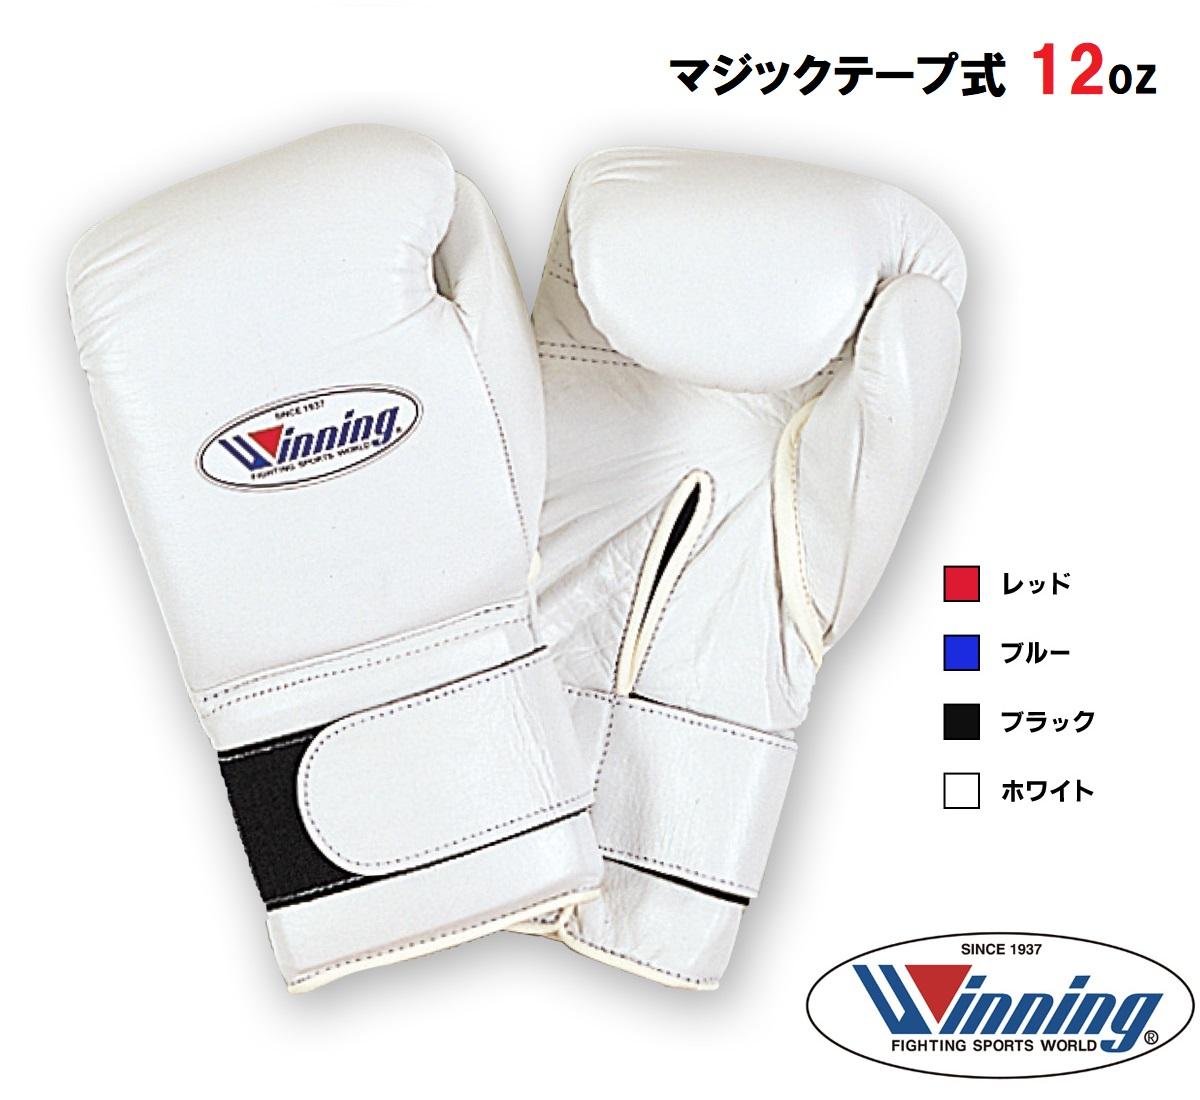 Winning ボクシンググローブ 練習用 プロフェッショナルタイプ マジックテープ式 12oz MS-400-B //WINNING ウィニング ウイニング ボクシング 受注生産品 送料無料